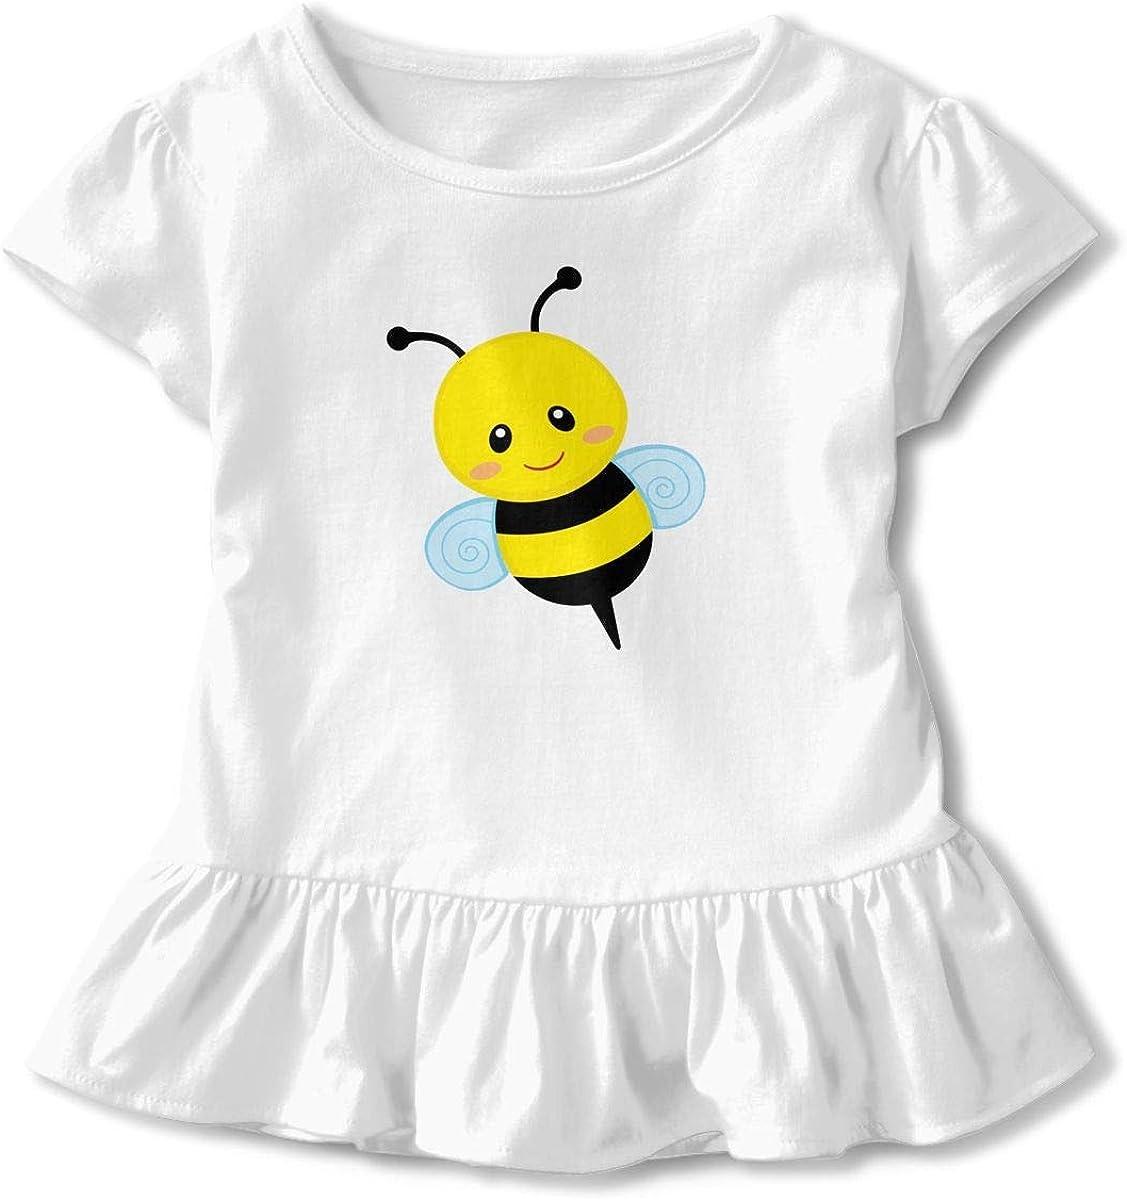 Cute Bumblebee Baby Flounces Skirts Toddler Cute T Shirt Dress Comfort Clothes